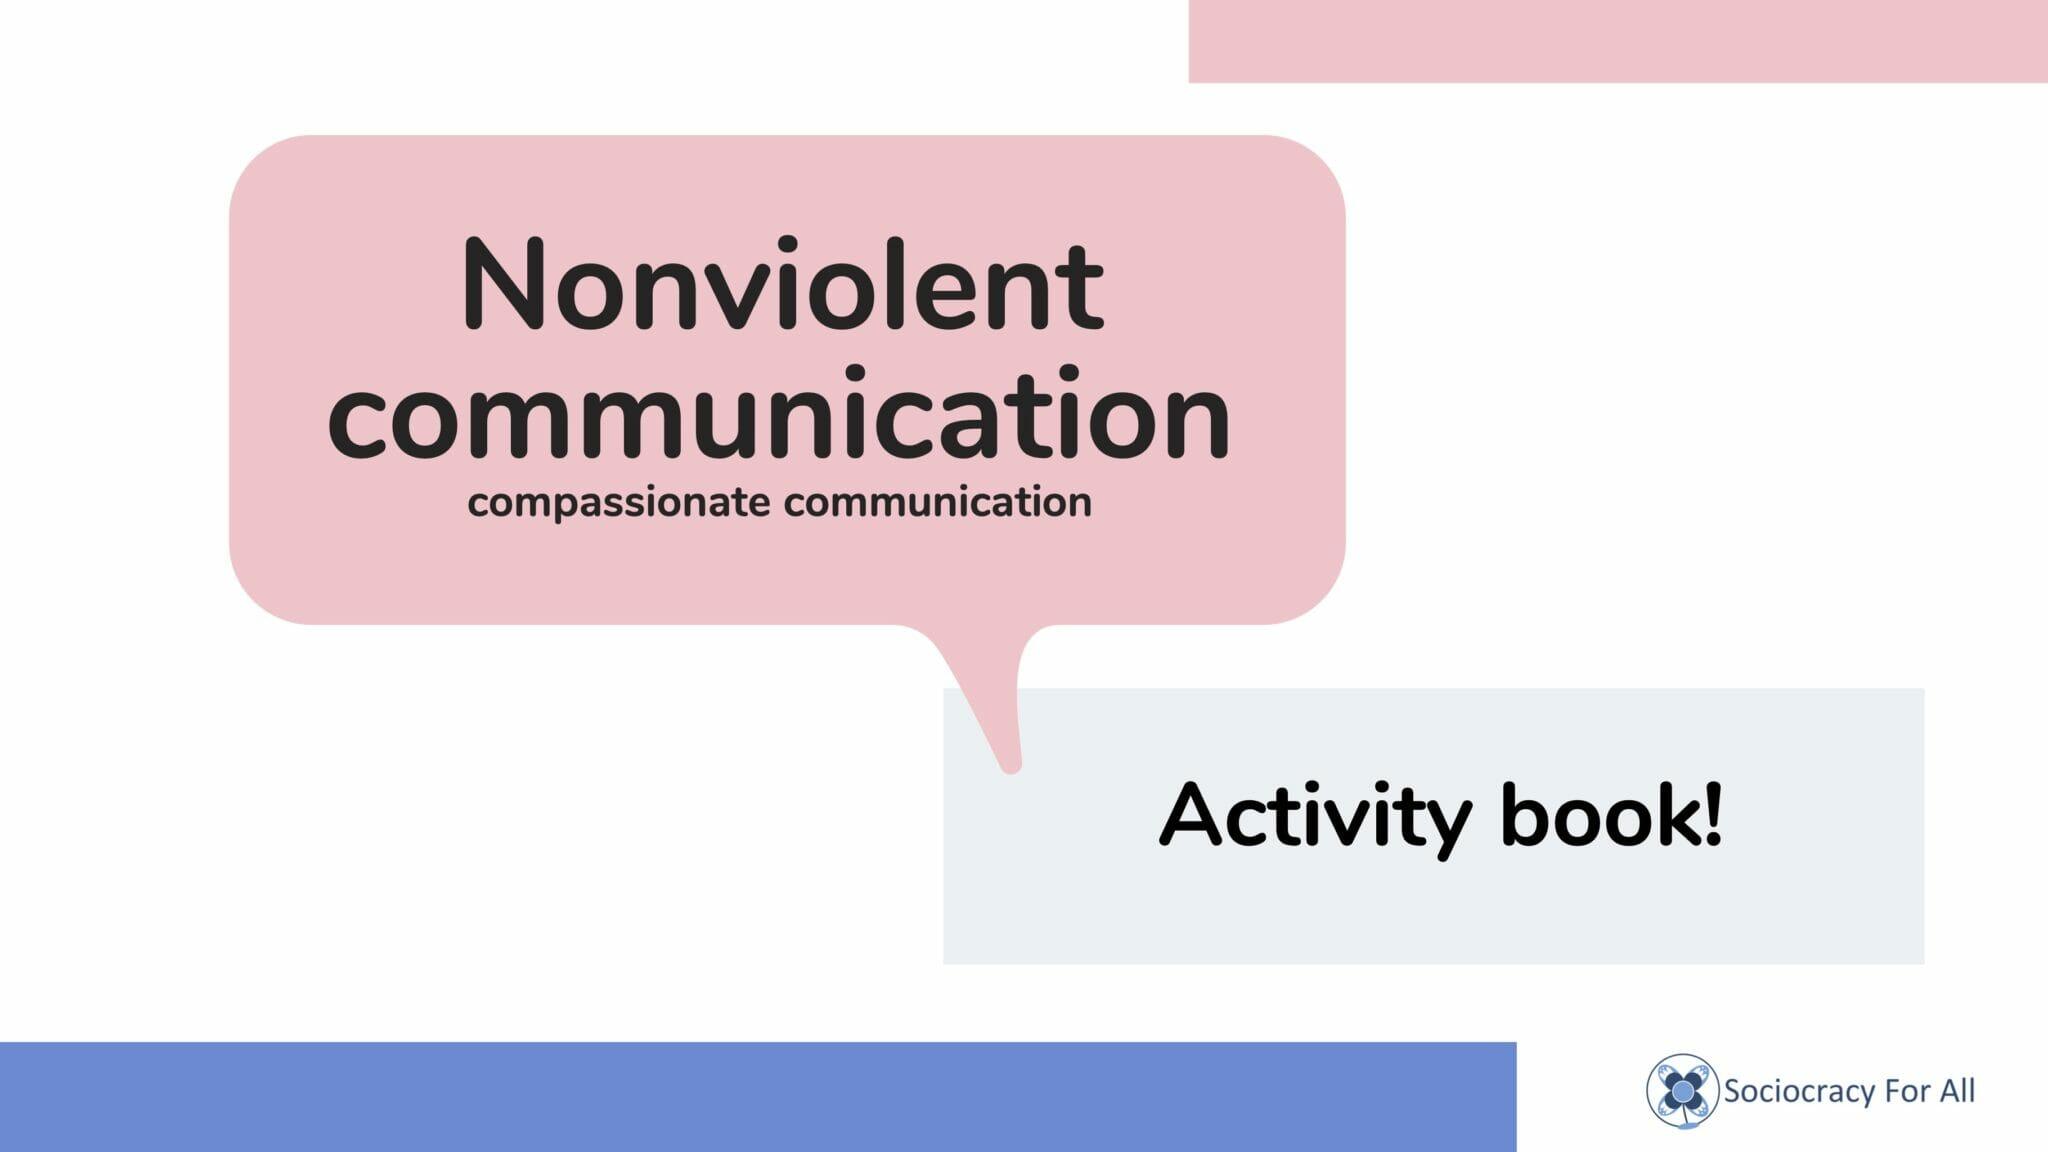 NVC activity book